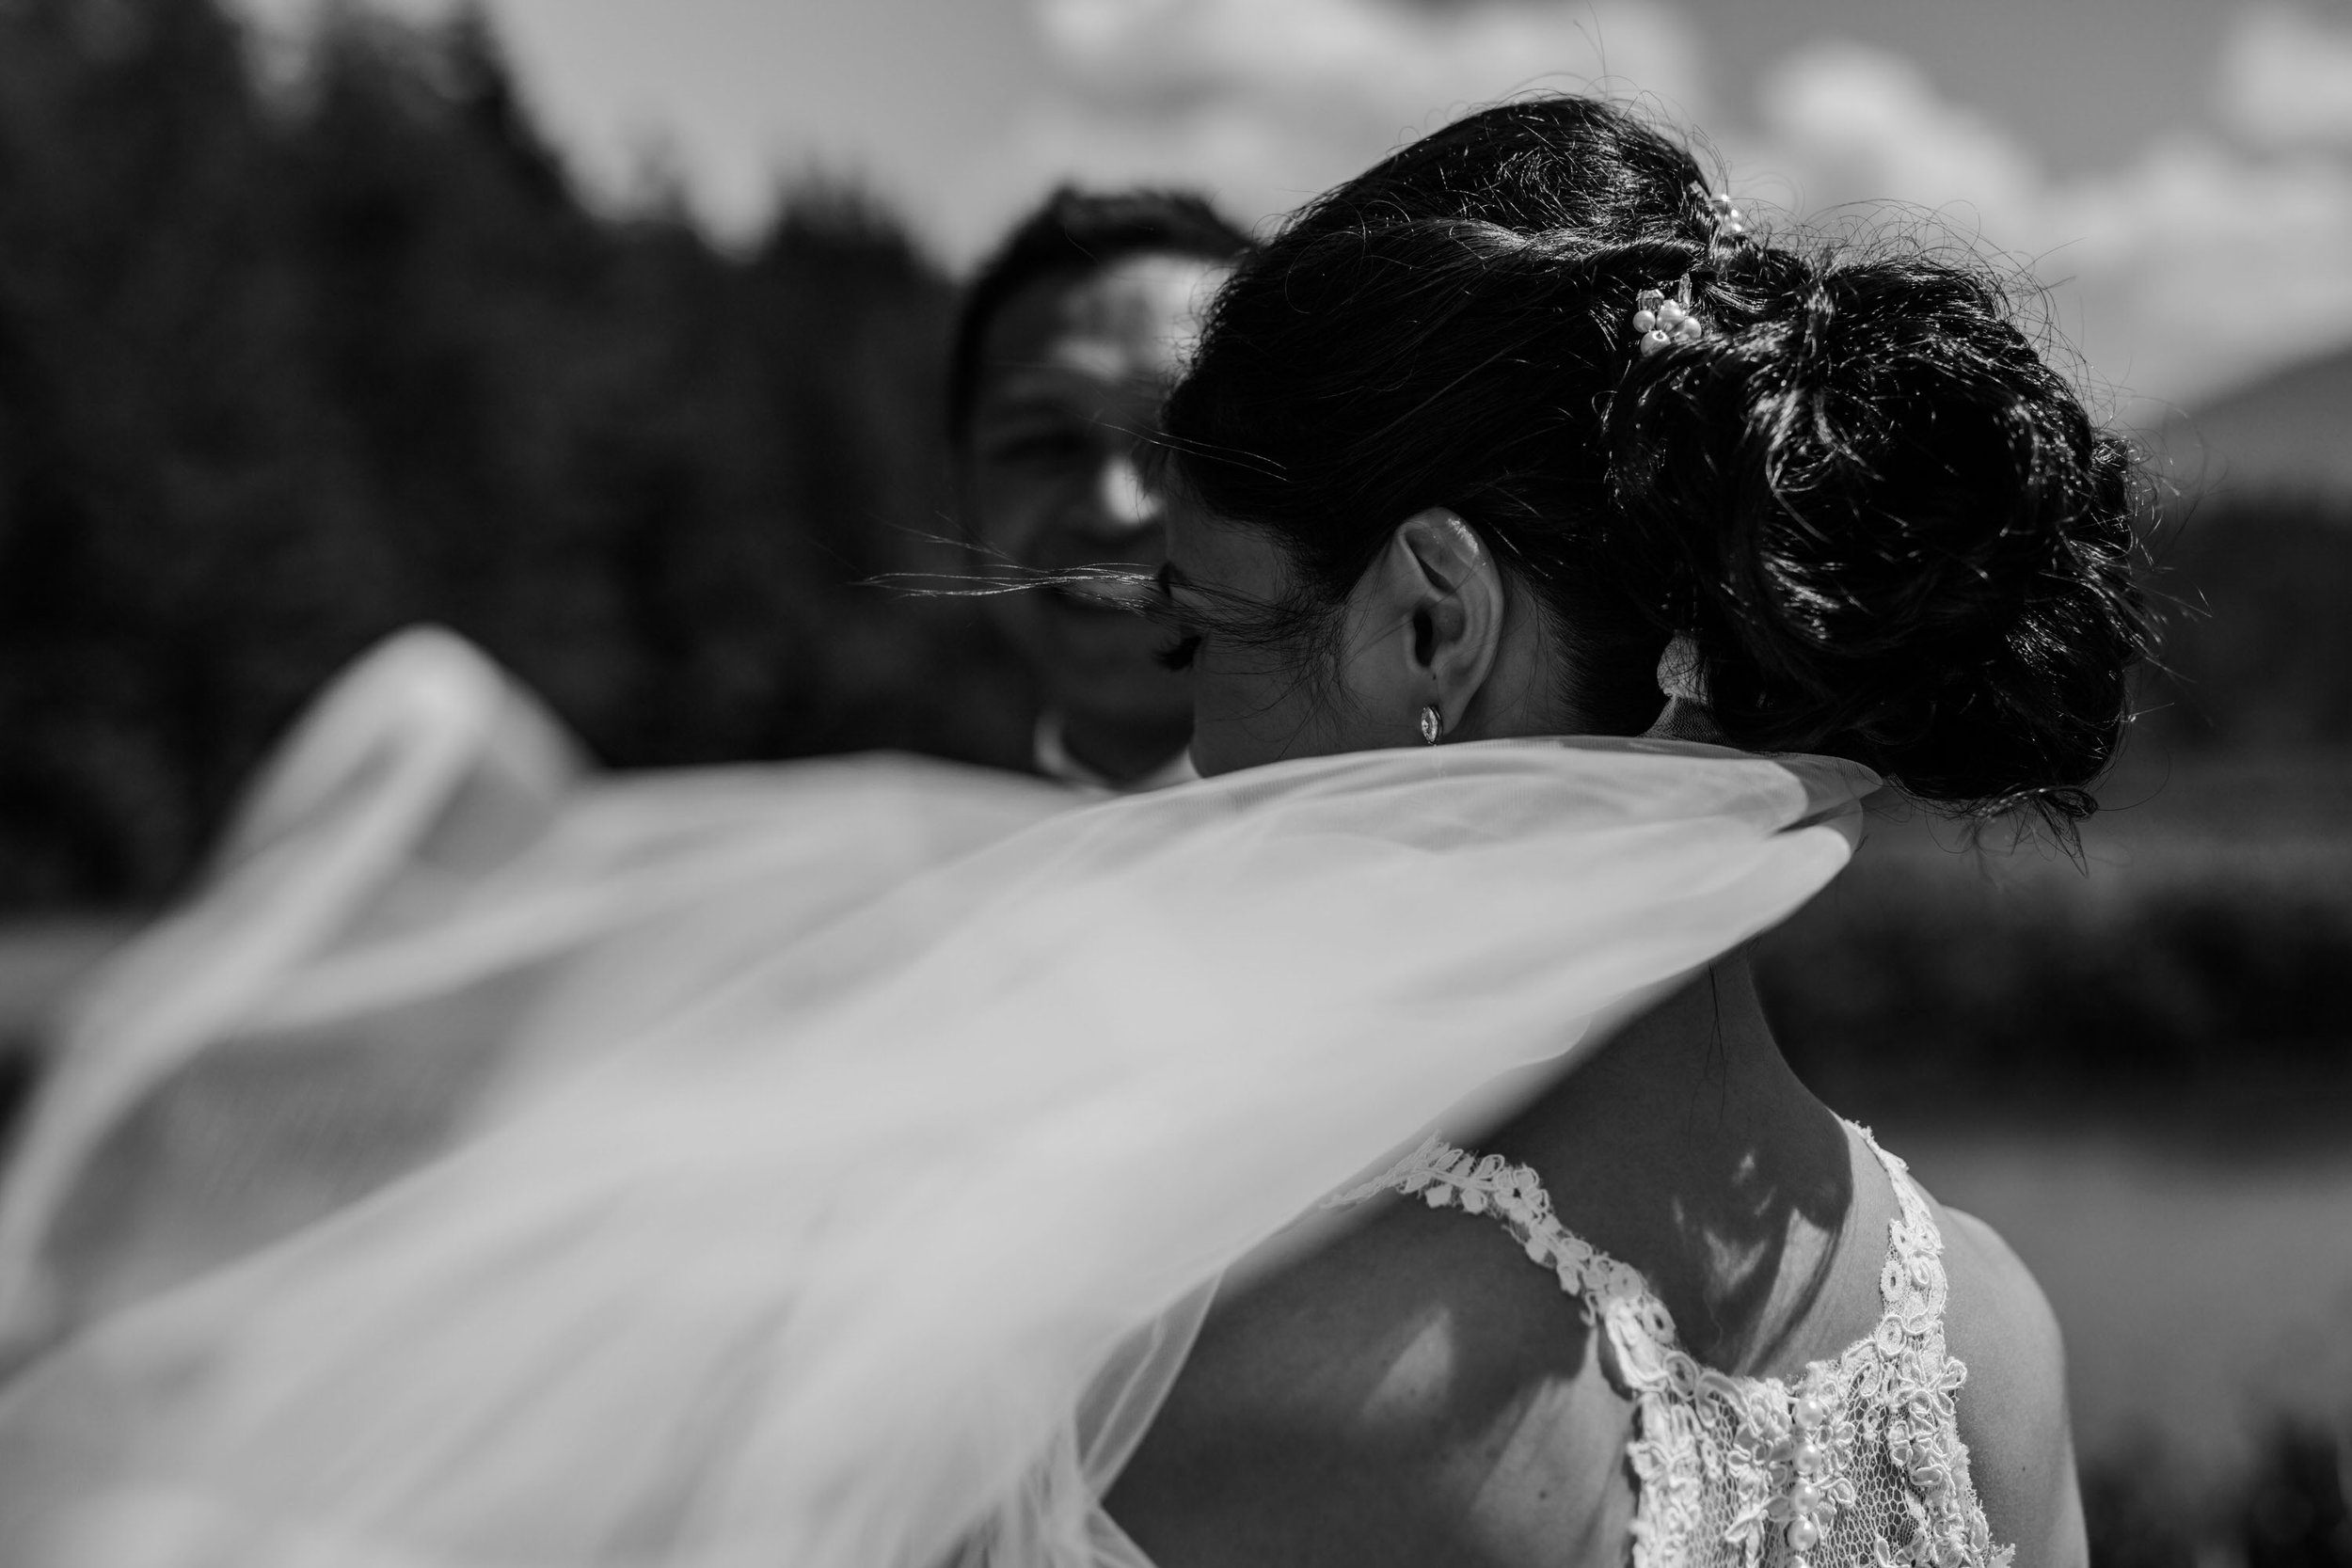 Sea to Sky Gondola Wedding - Vancouver Wedding Photographer & Videographer - Sunshine Coast Wedding Photos - Sunshine Coast Wedding Photographer - Jennifer Picard Photography - IMG_2275.jpg